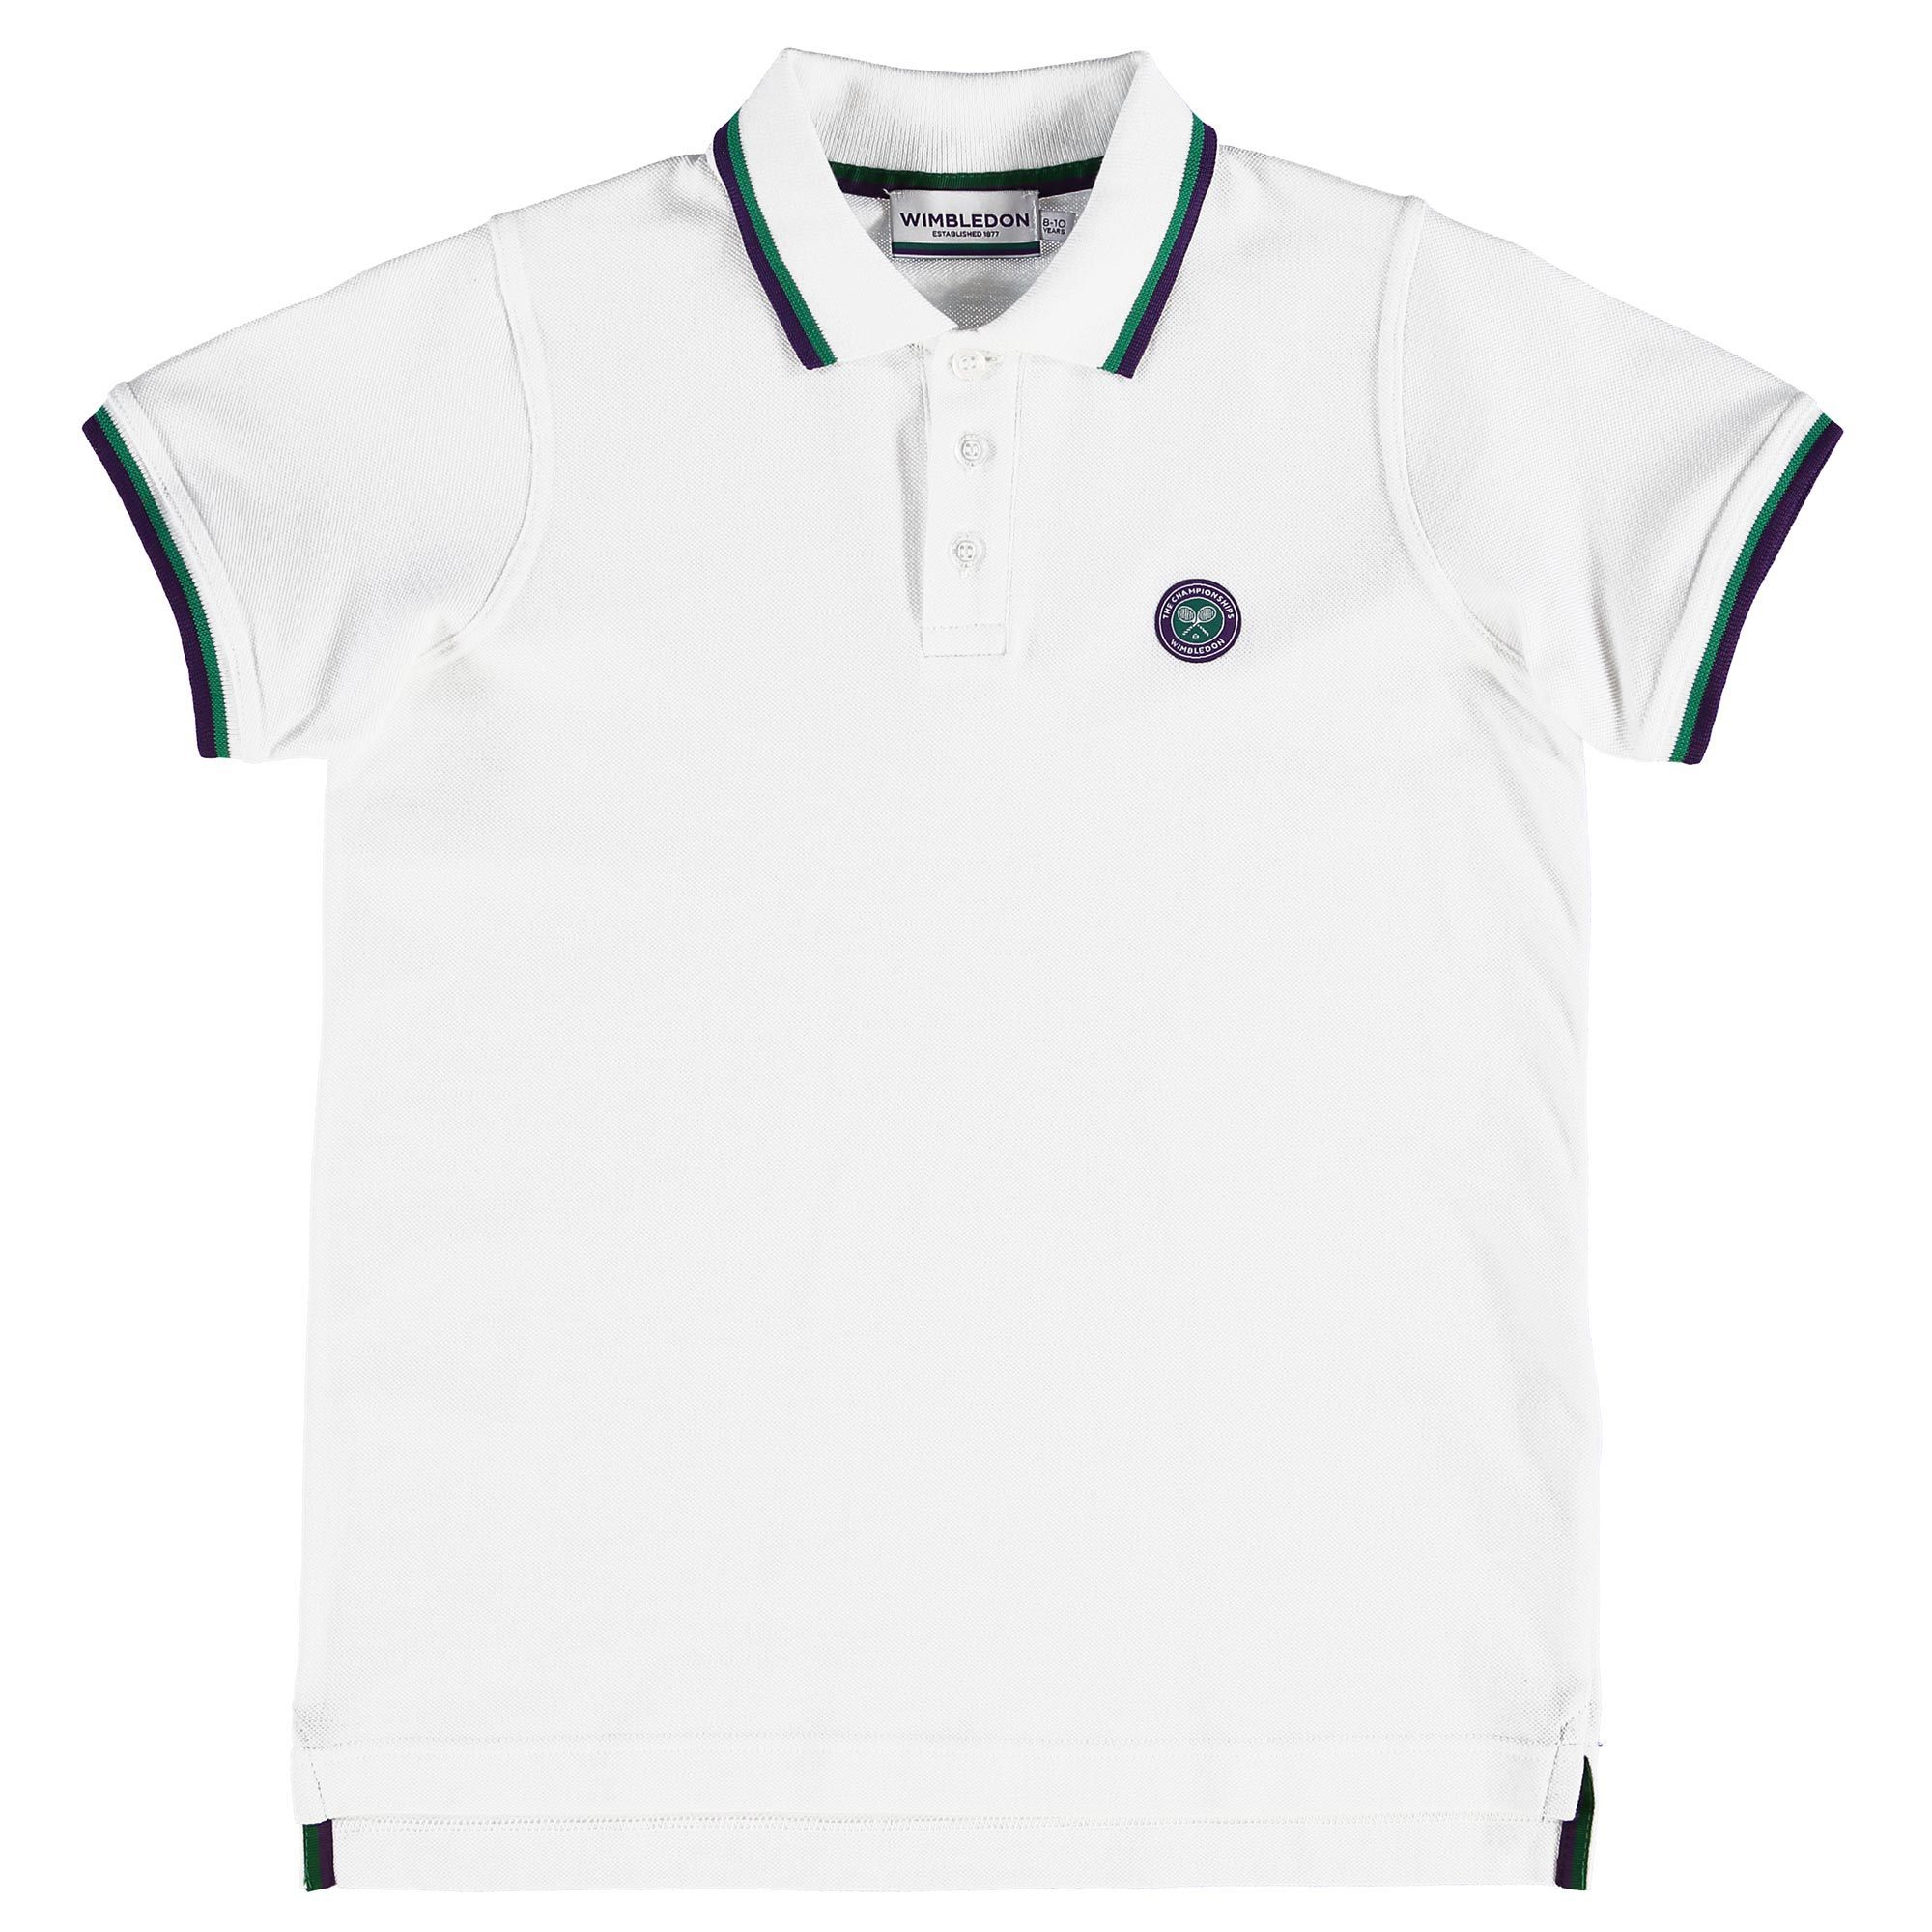 Wimbledon Classic Pique Polo - White - Junior